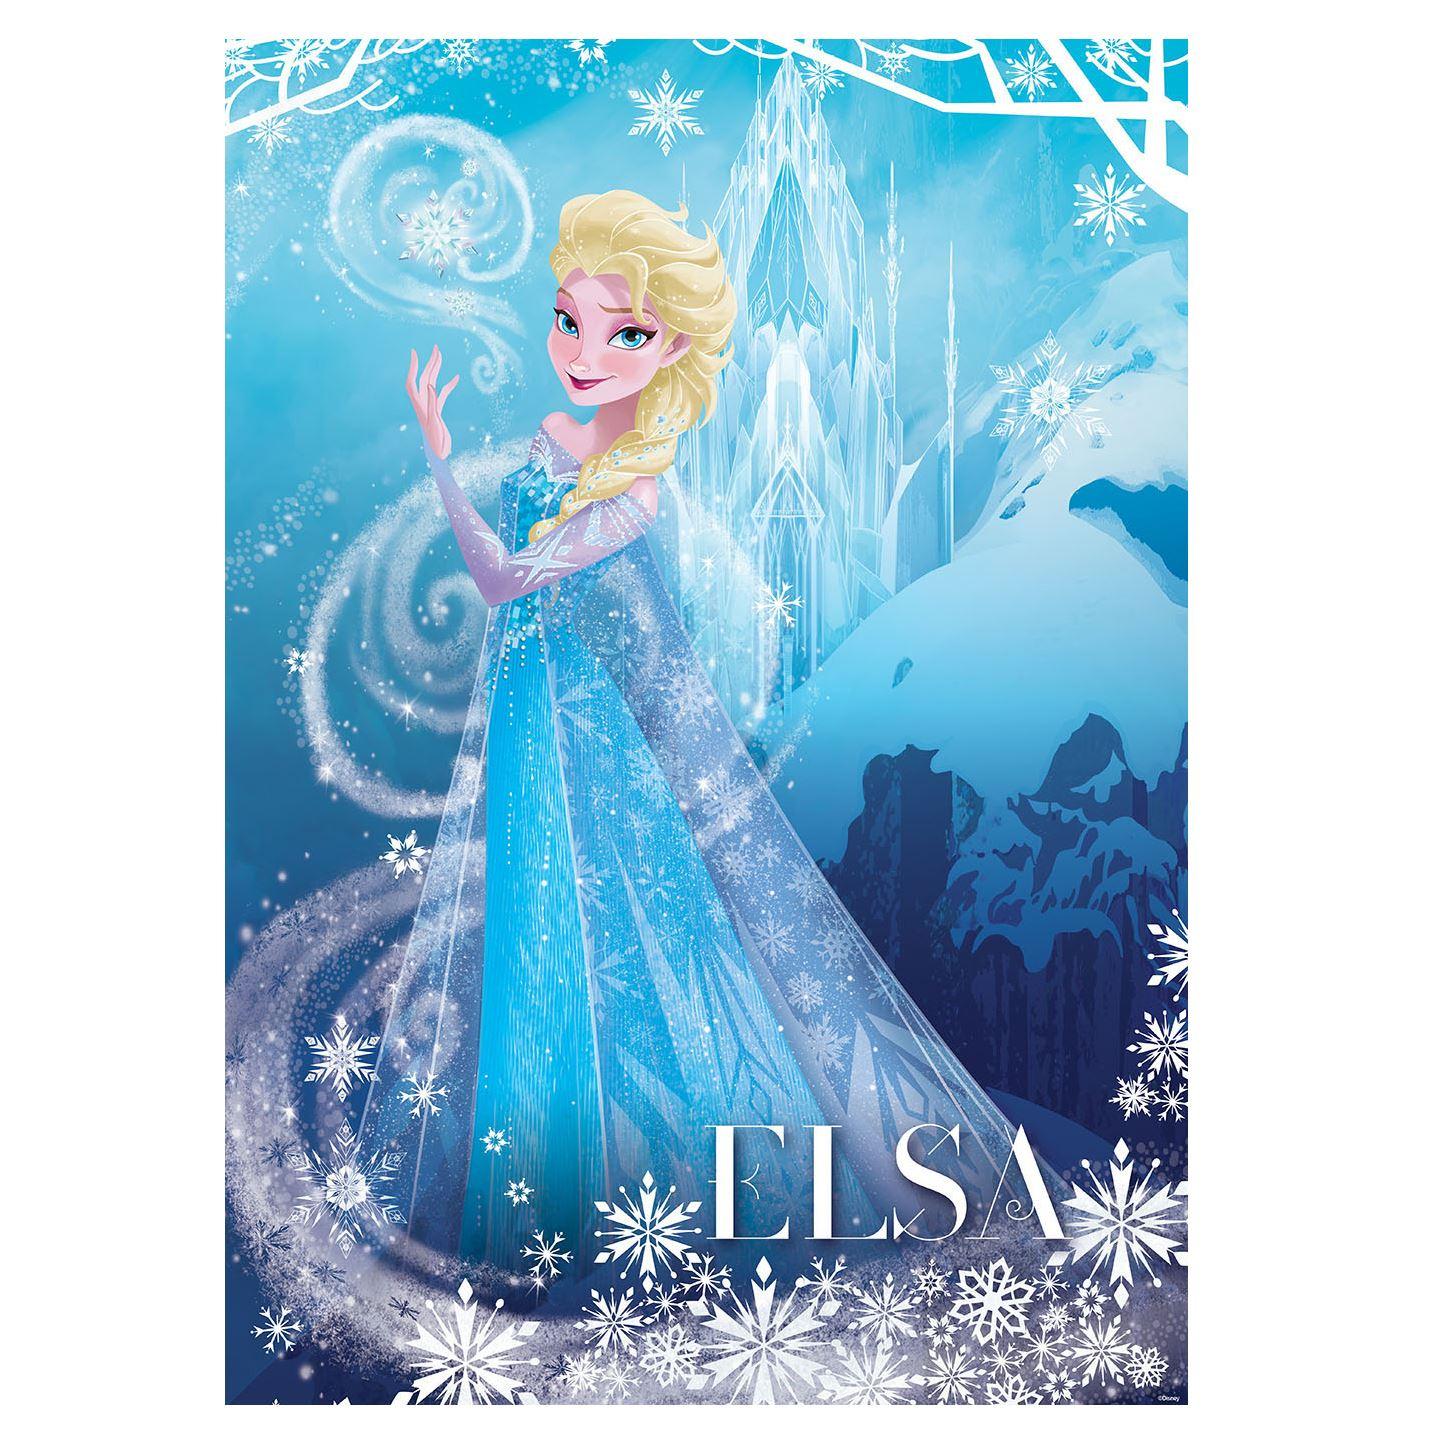 princess elsa disney wallpaper - photo #23